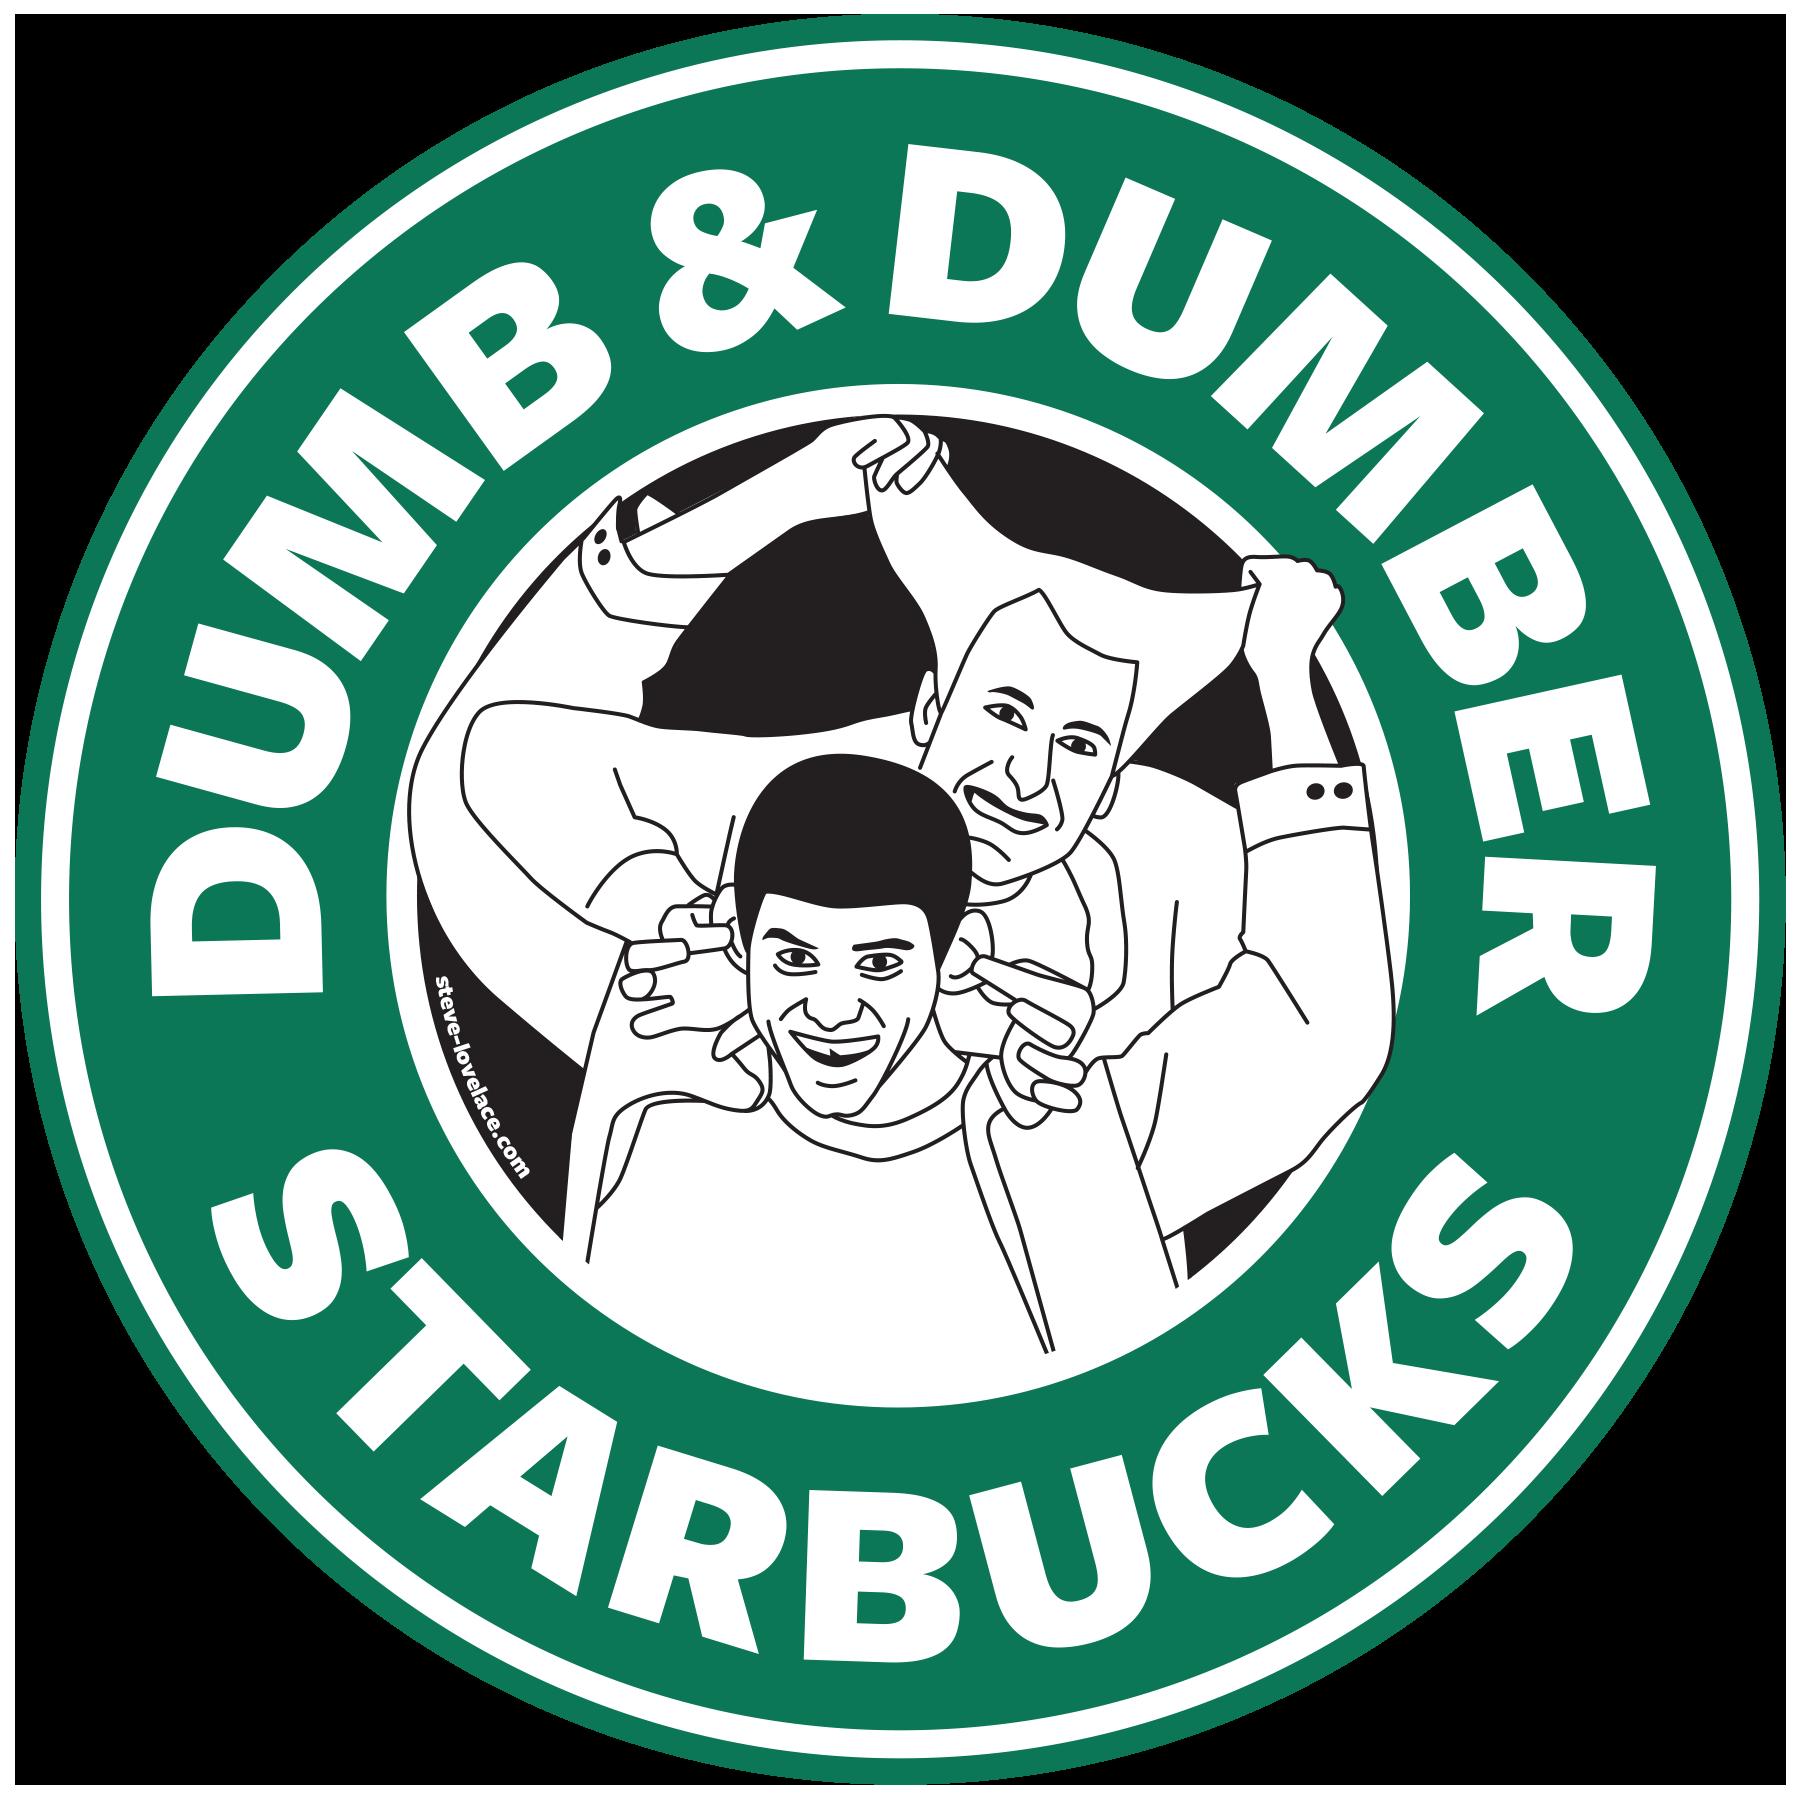 Starbucks clipart logo starbucks. Coffee history drinker dumb